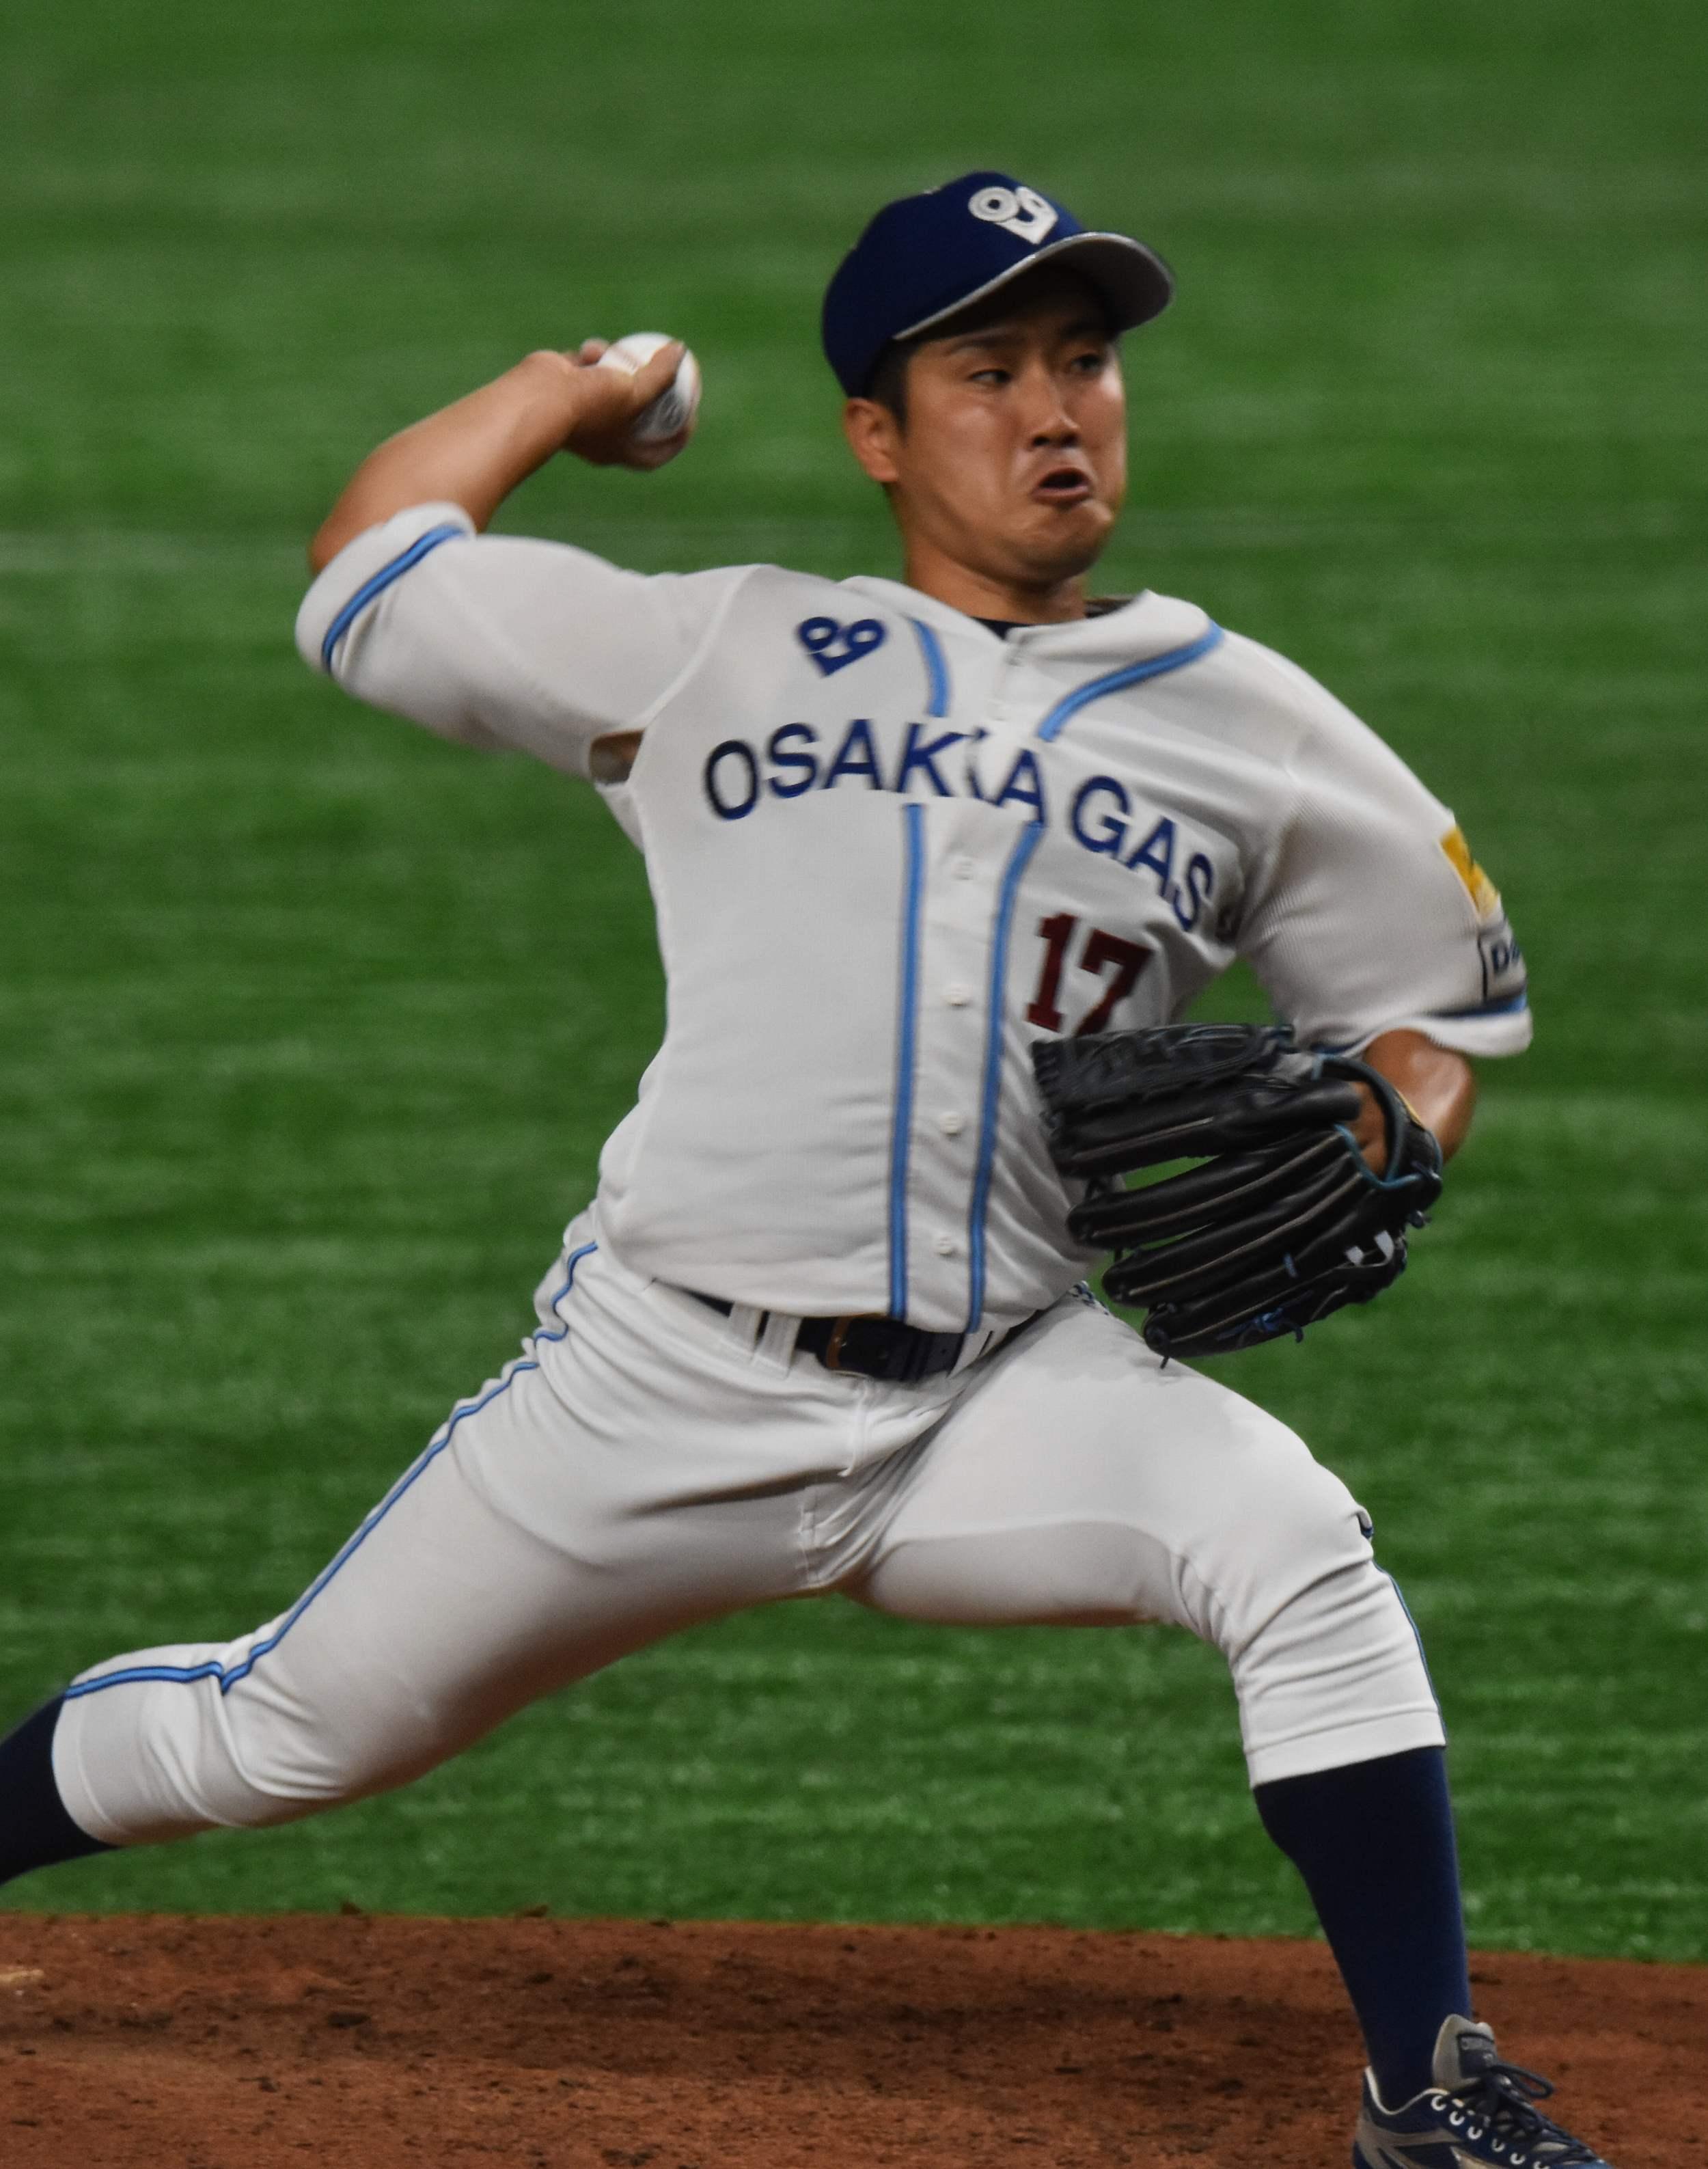 20190718大阪ガス 阪本